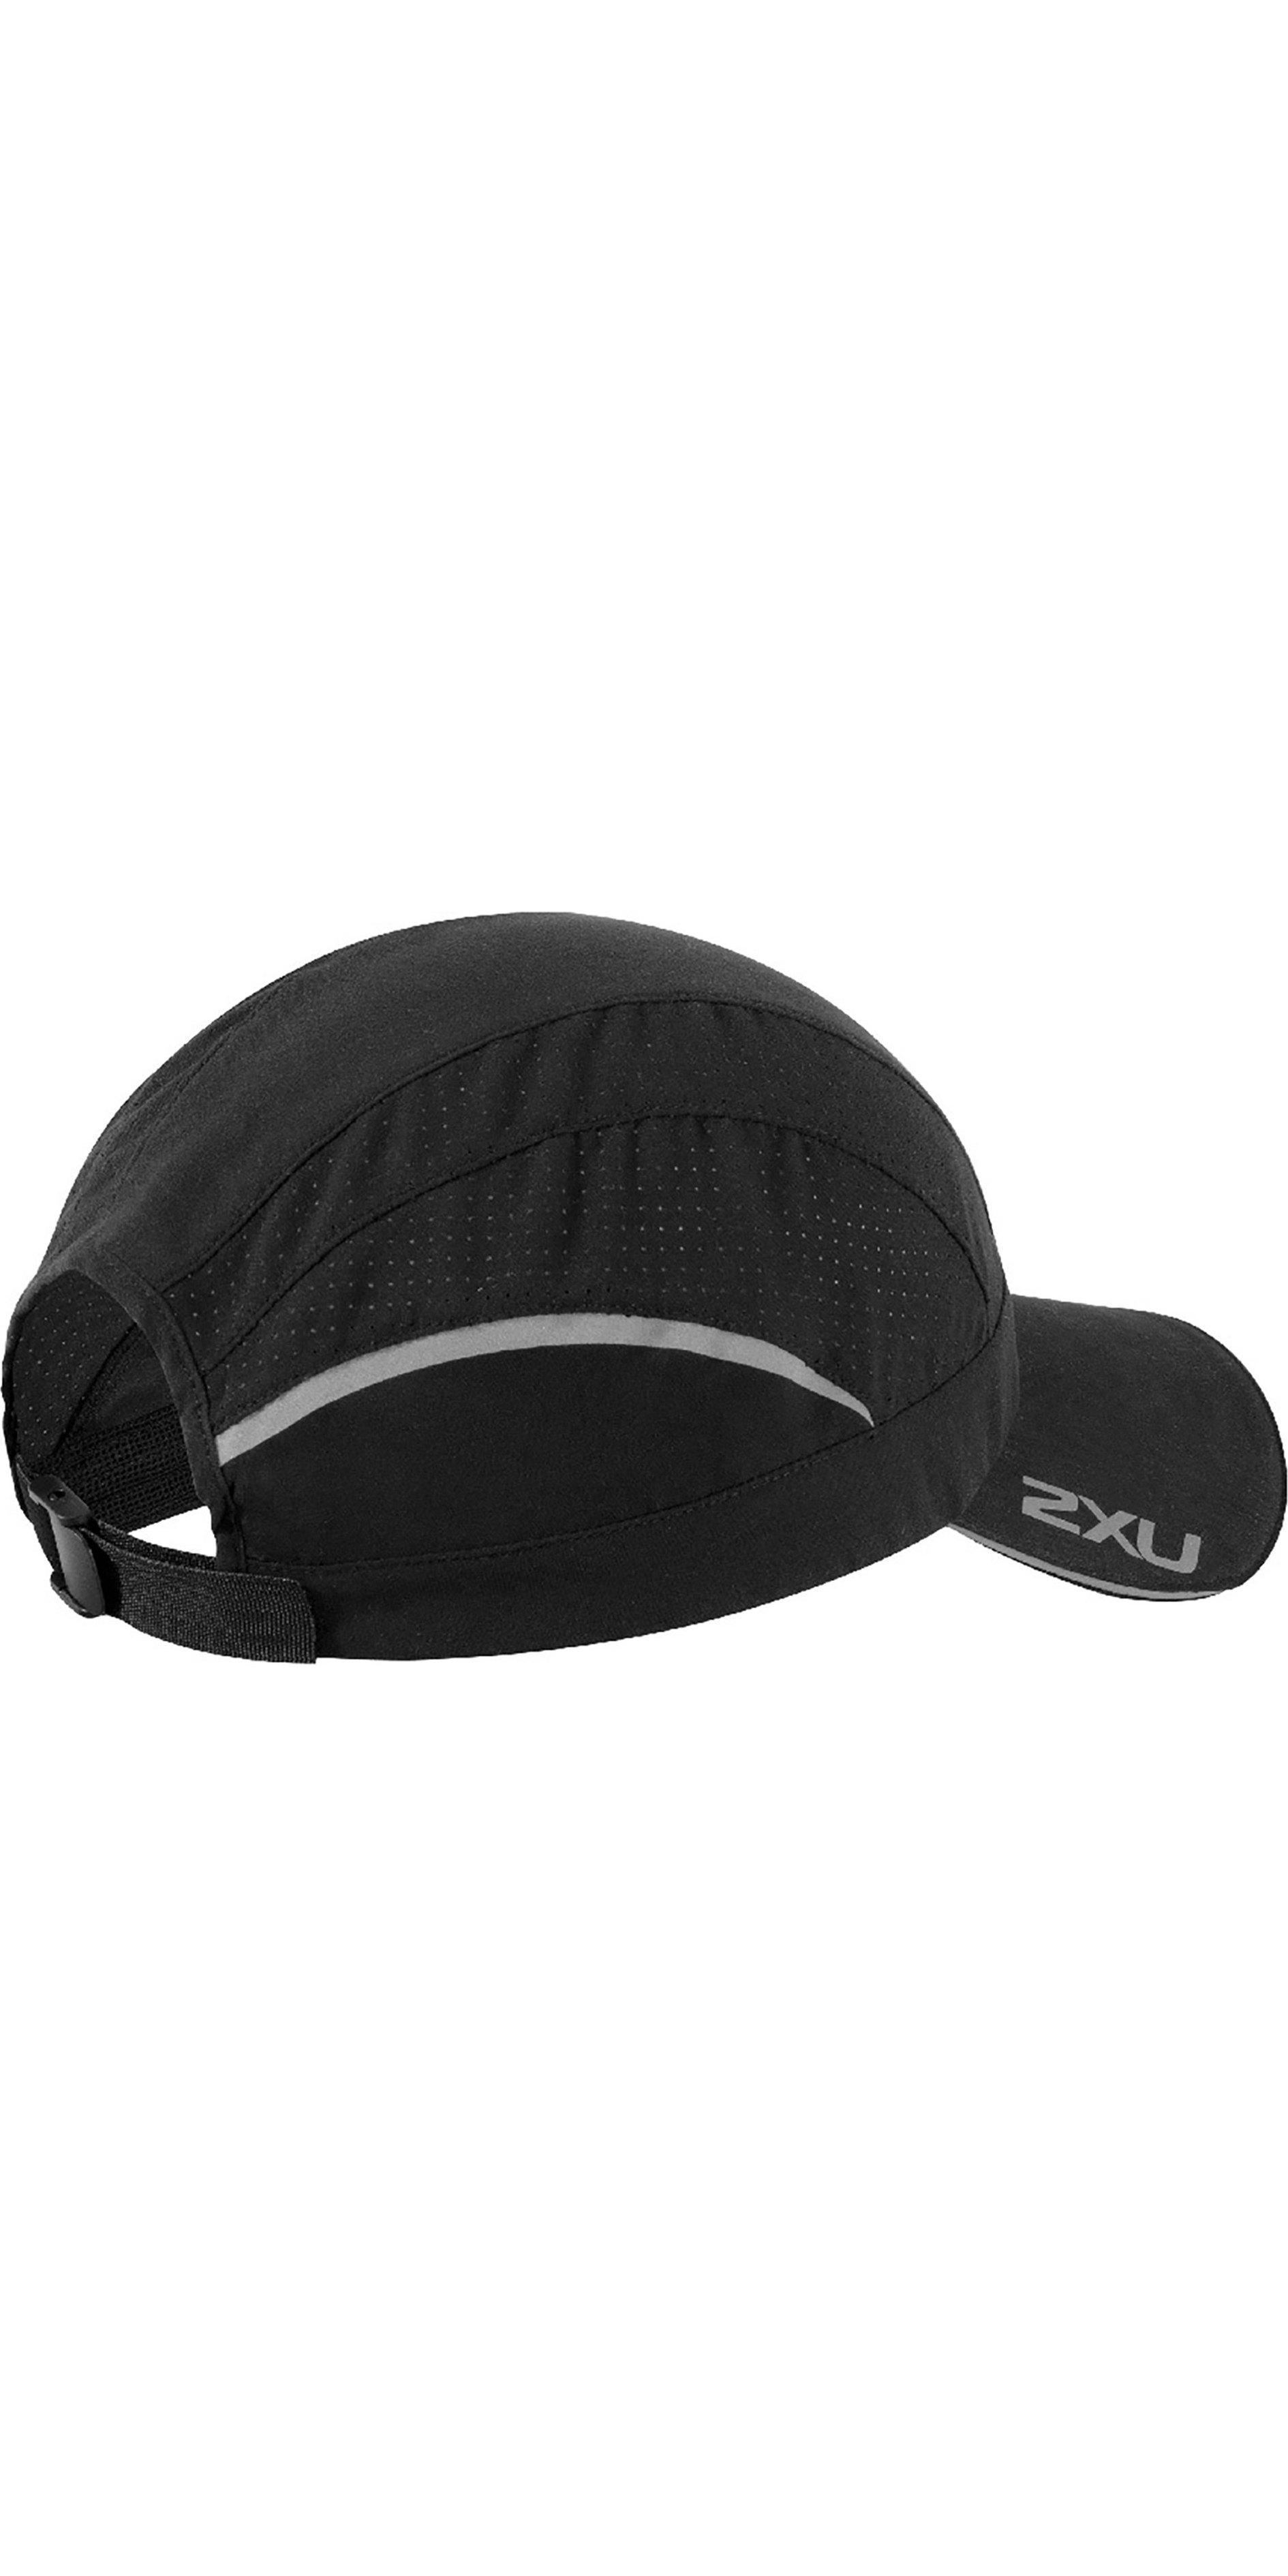 2019 2XU Quick Dry Vented Run Cap Black UQ5697f